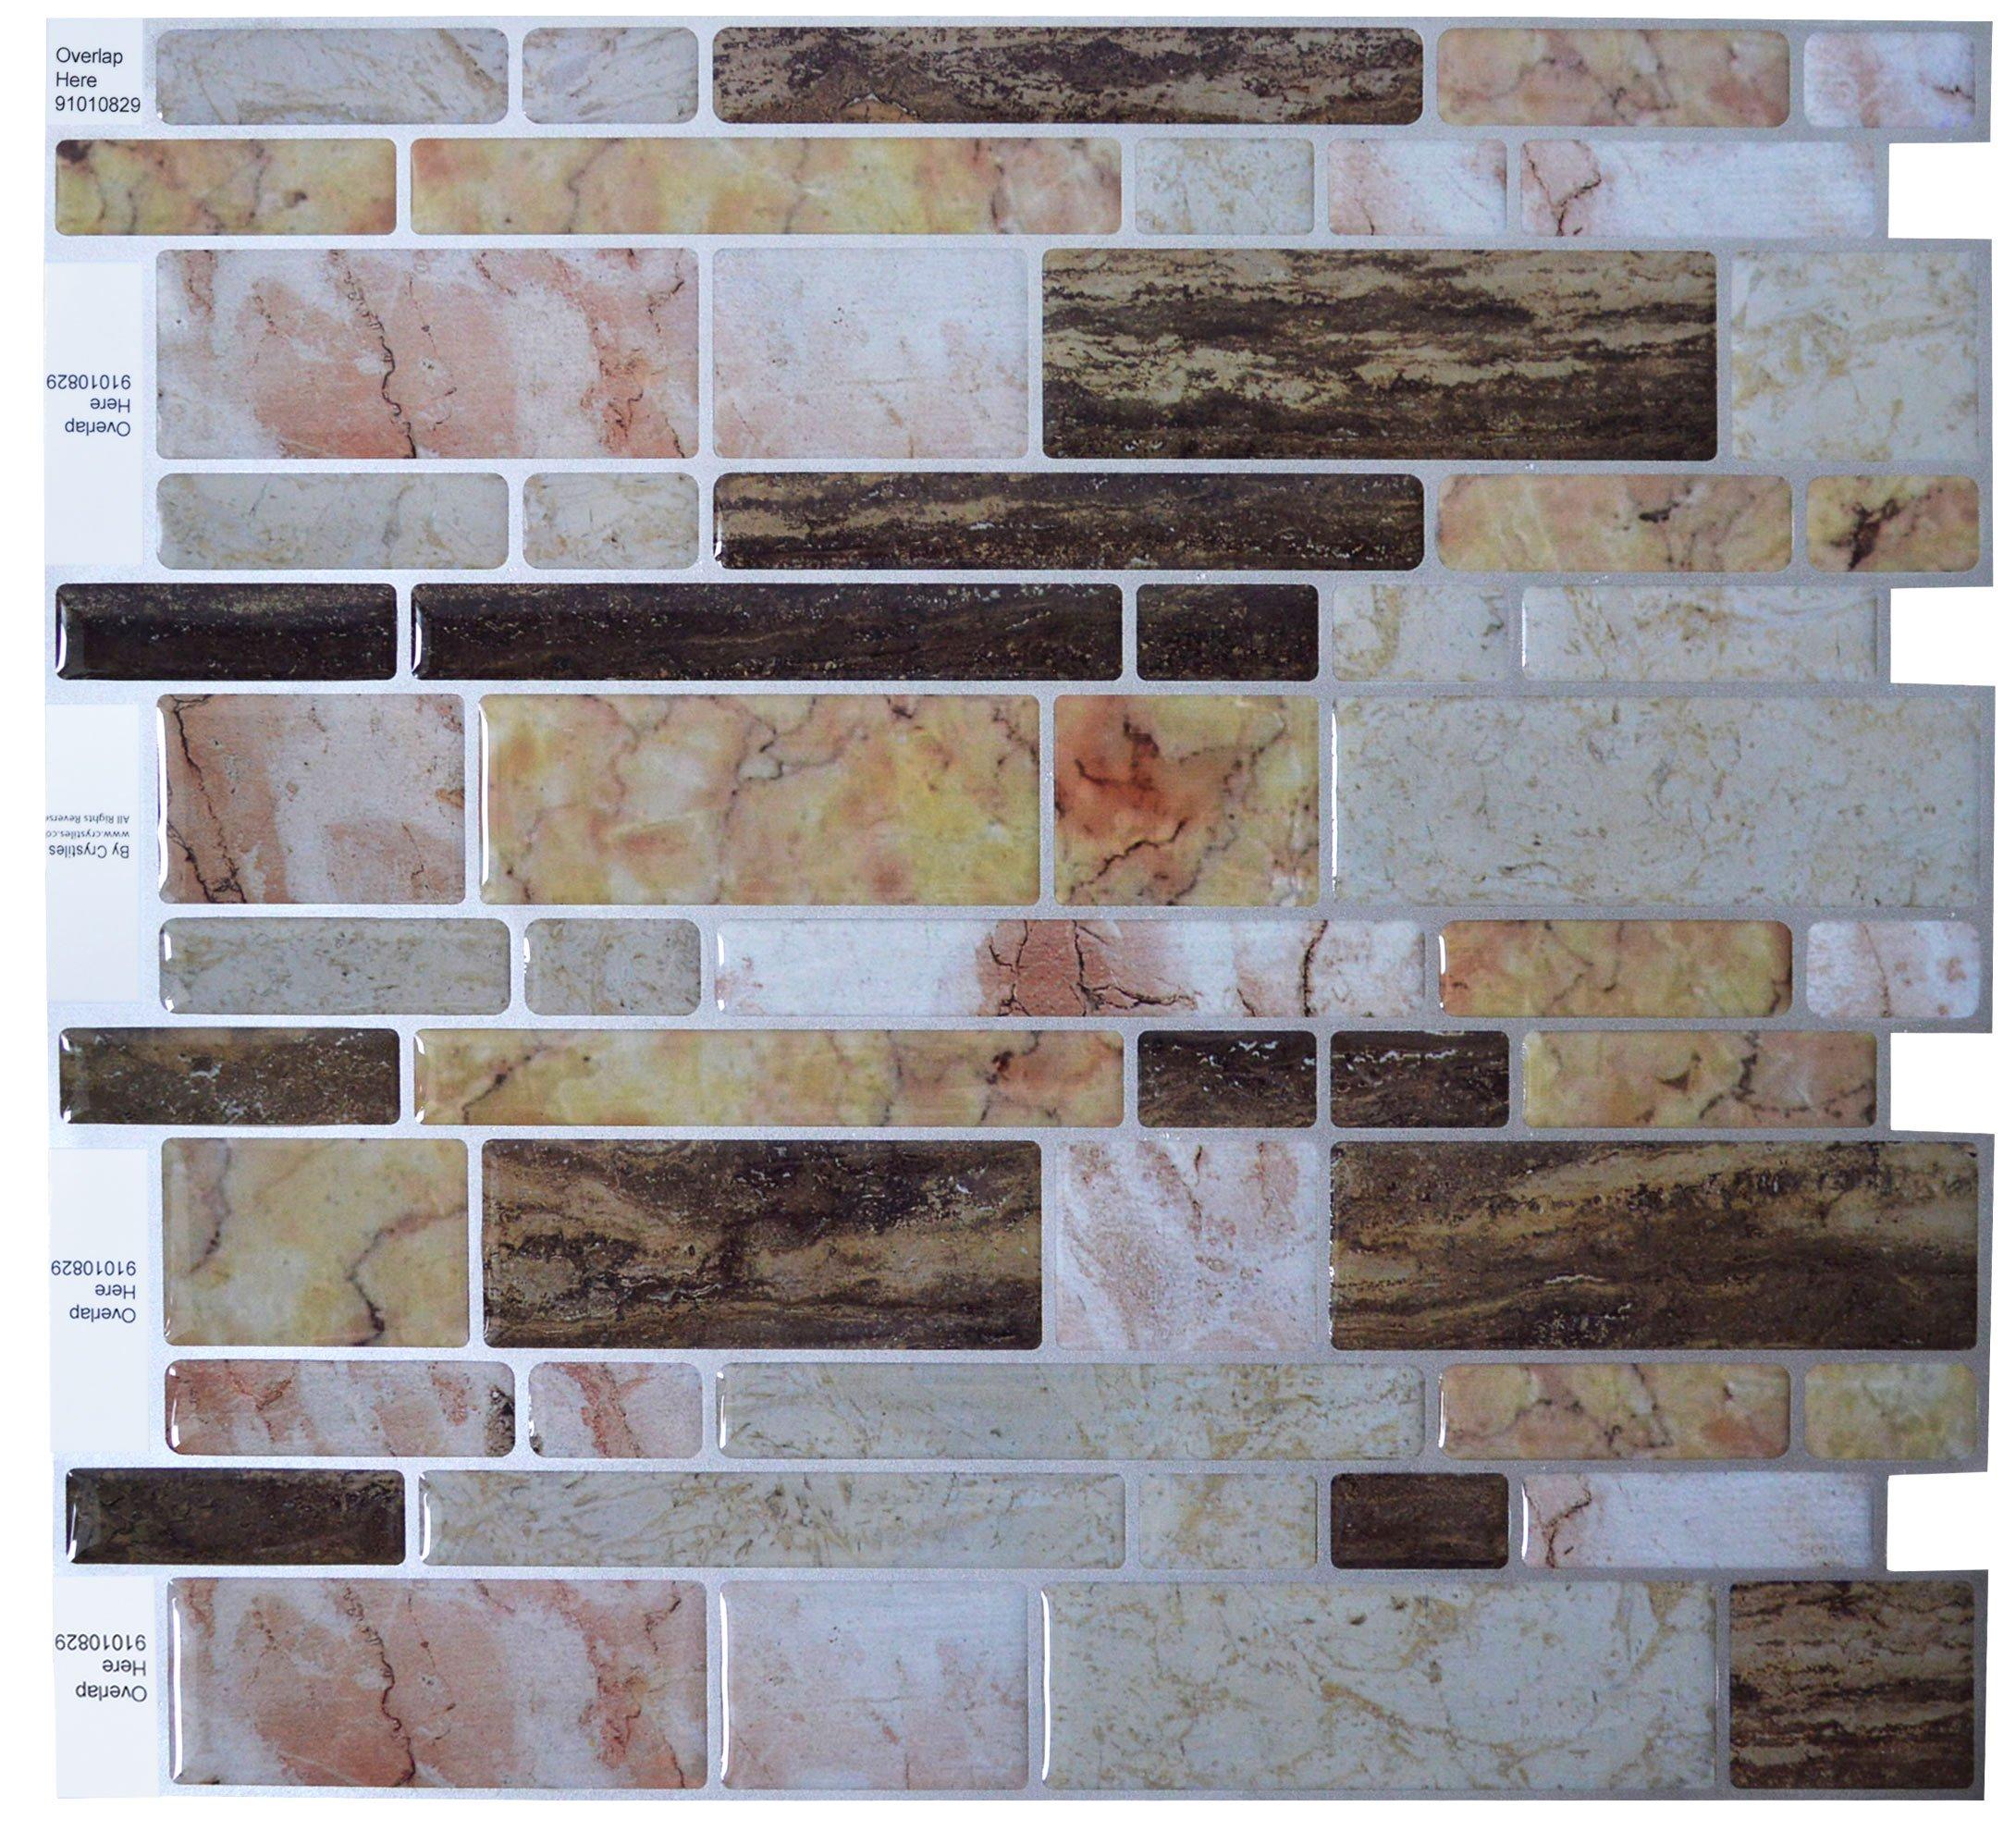 crystiles peel and stick self adhesive vinyl wall tiles multi color marble st ebay. Black Bedroom Furniture Sets. Home Design Ideas